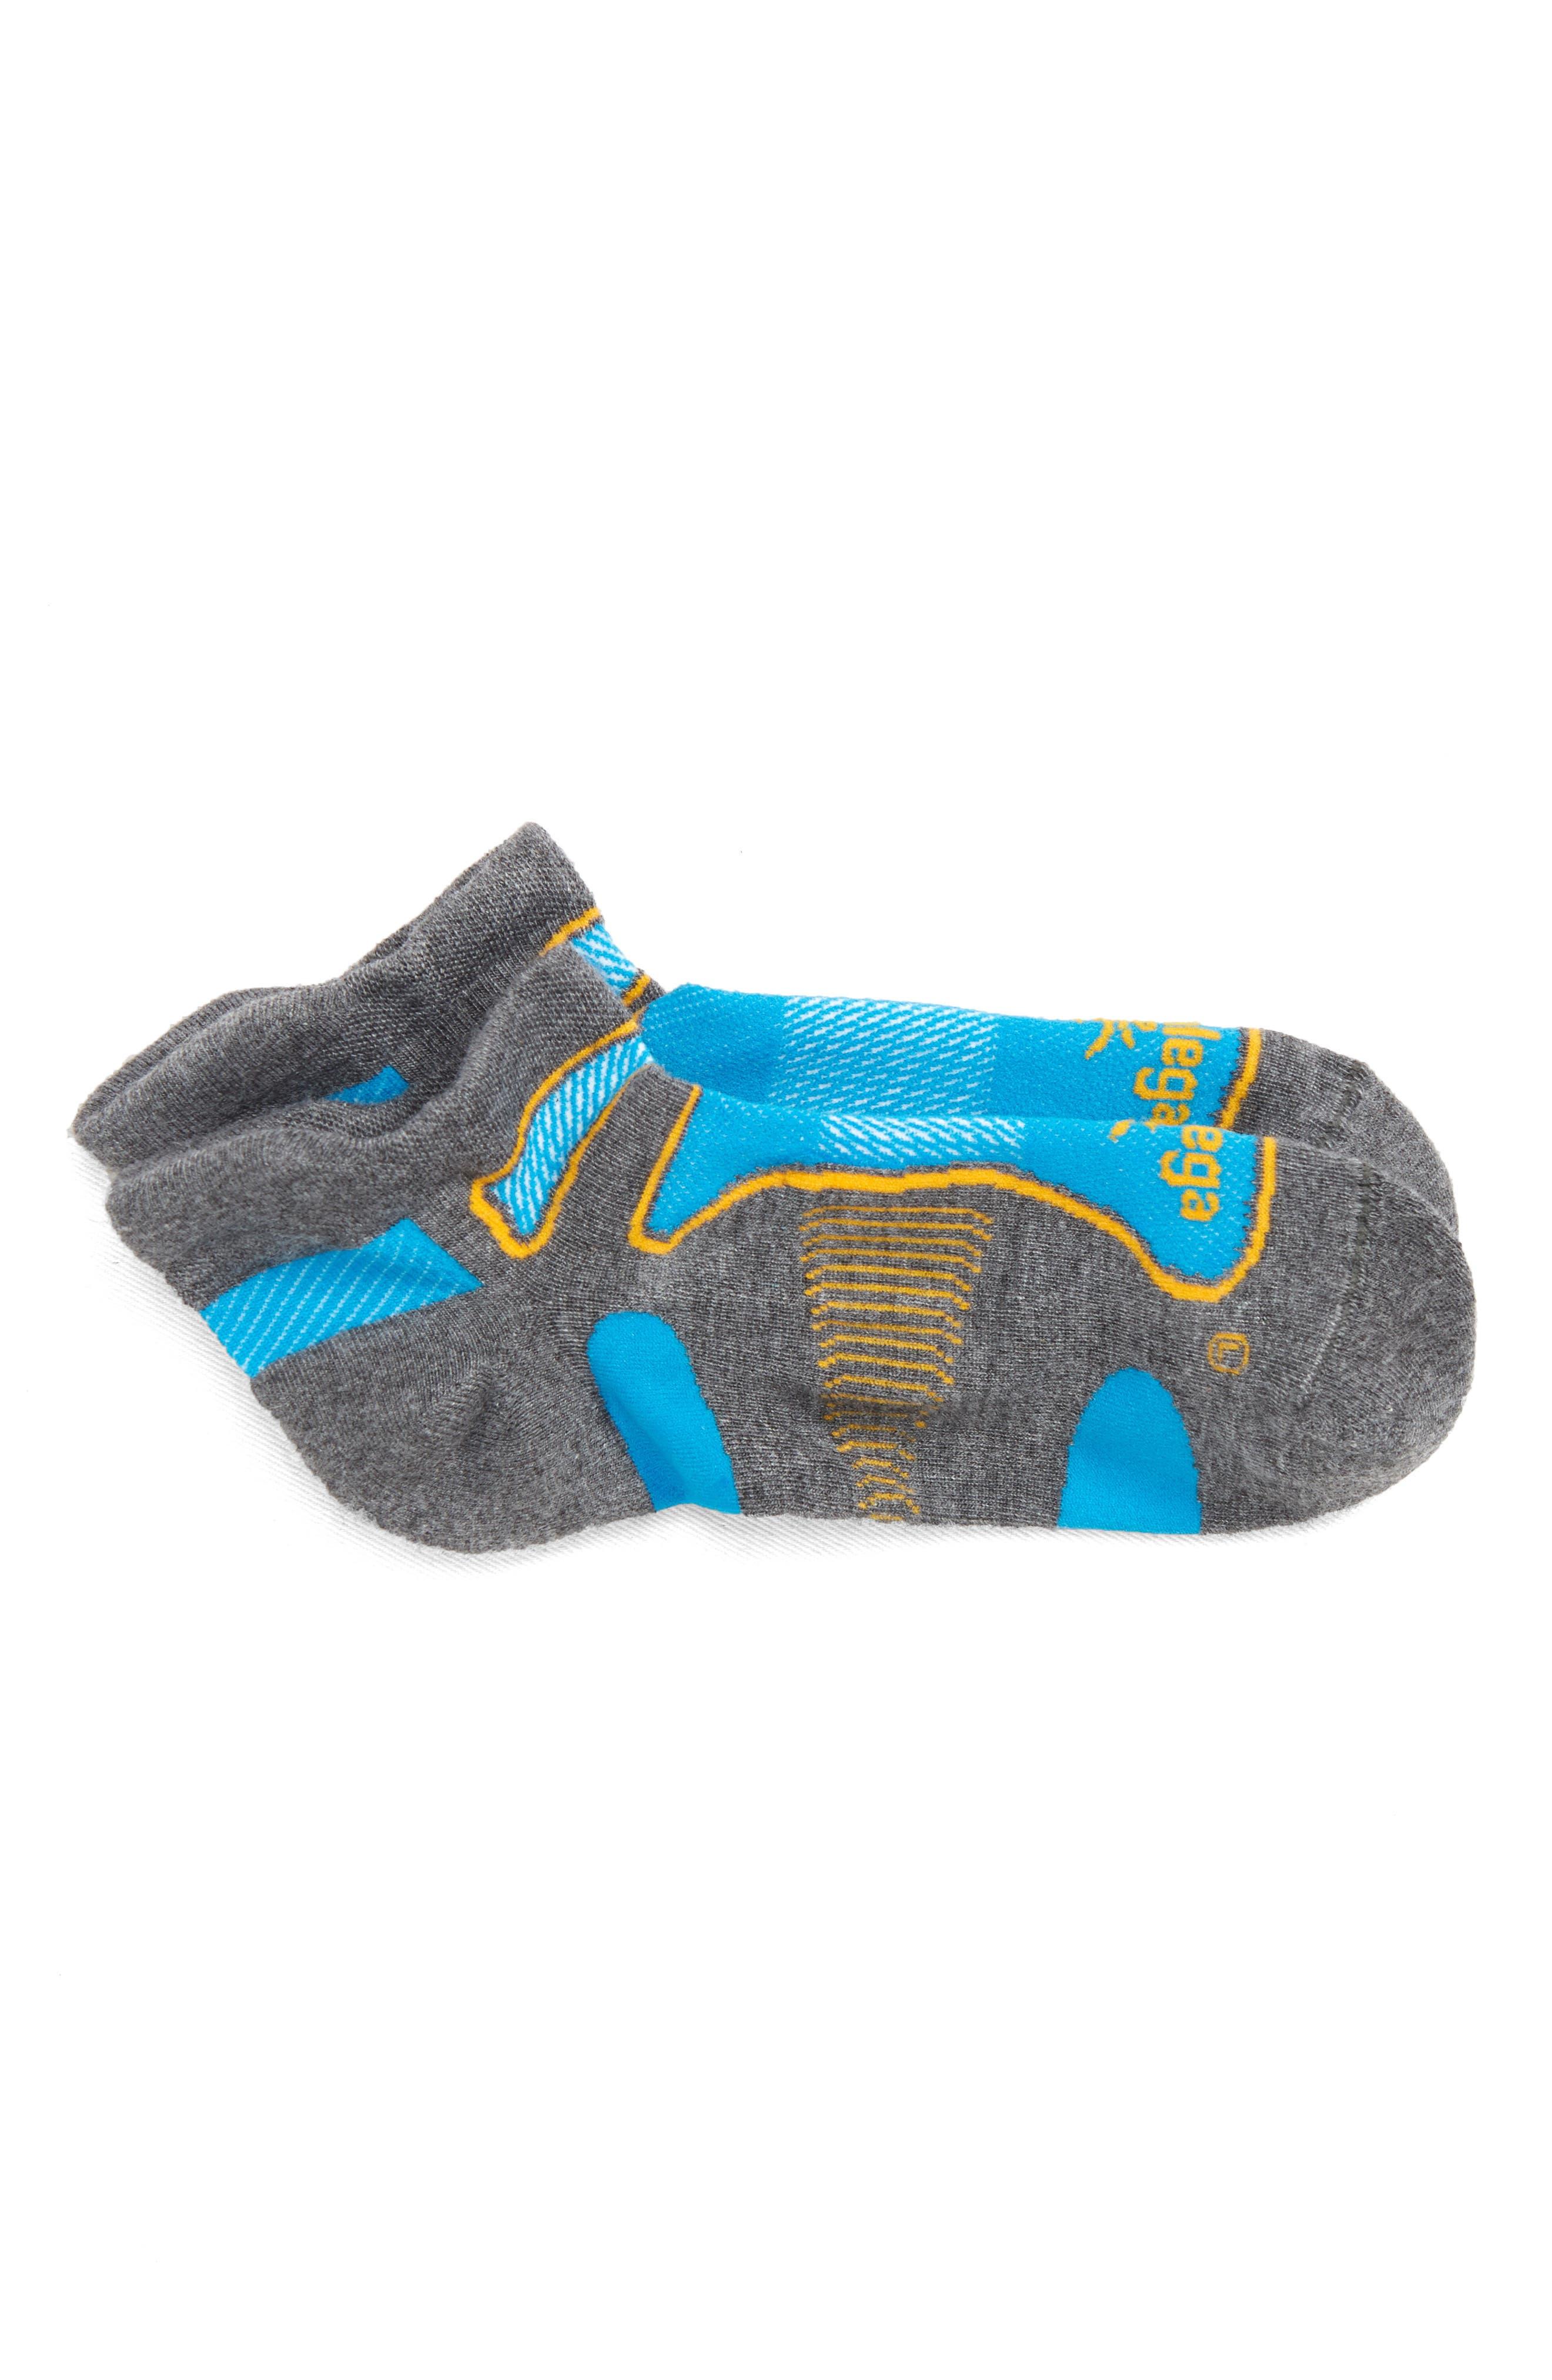 Silver Socks,                         Main,                         color, 499